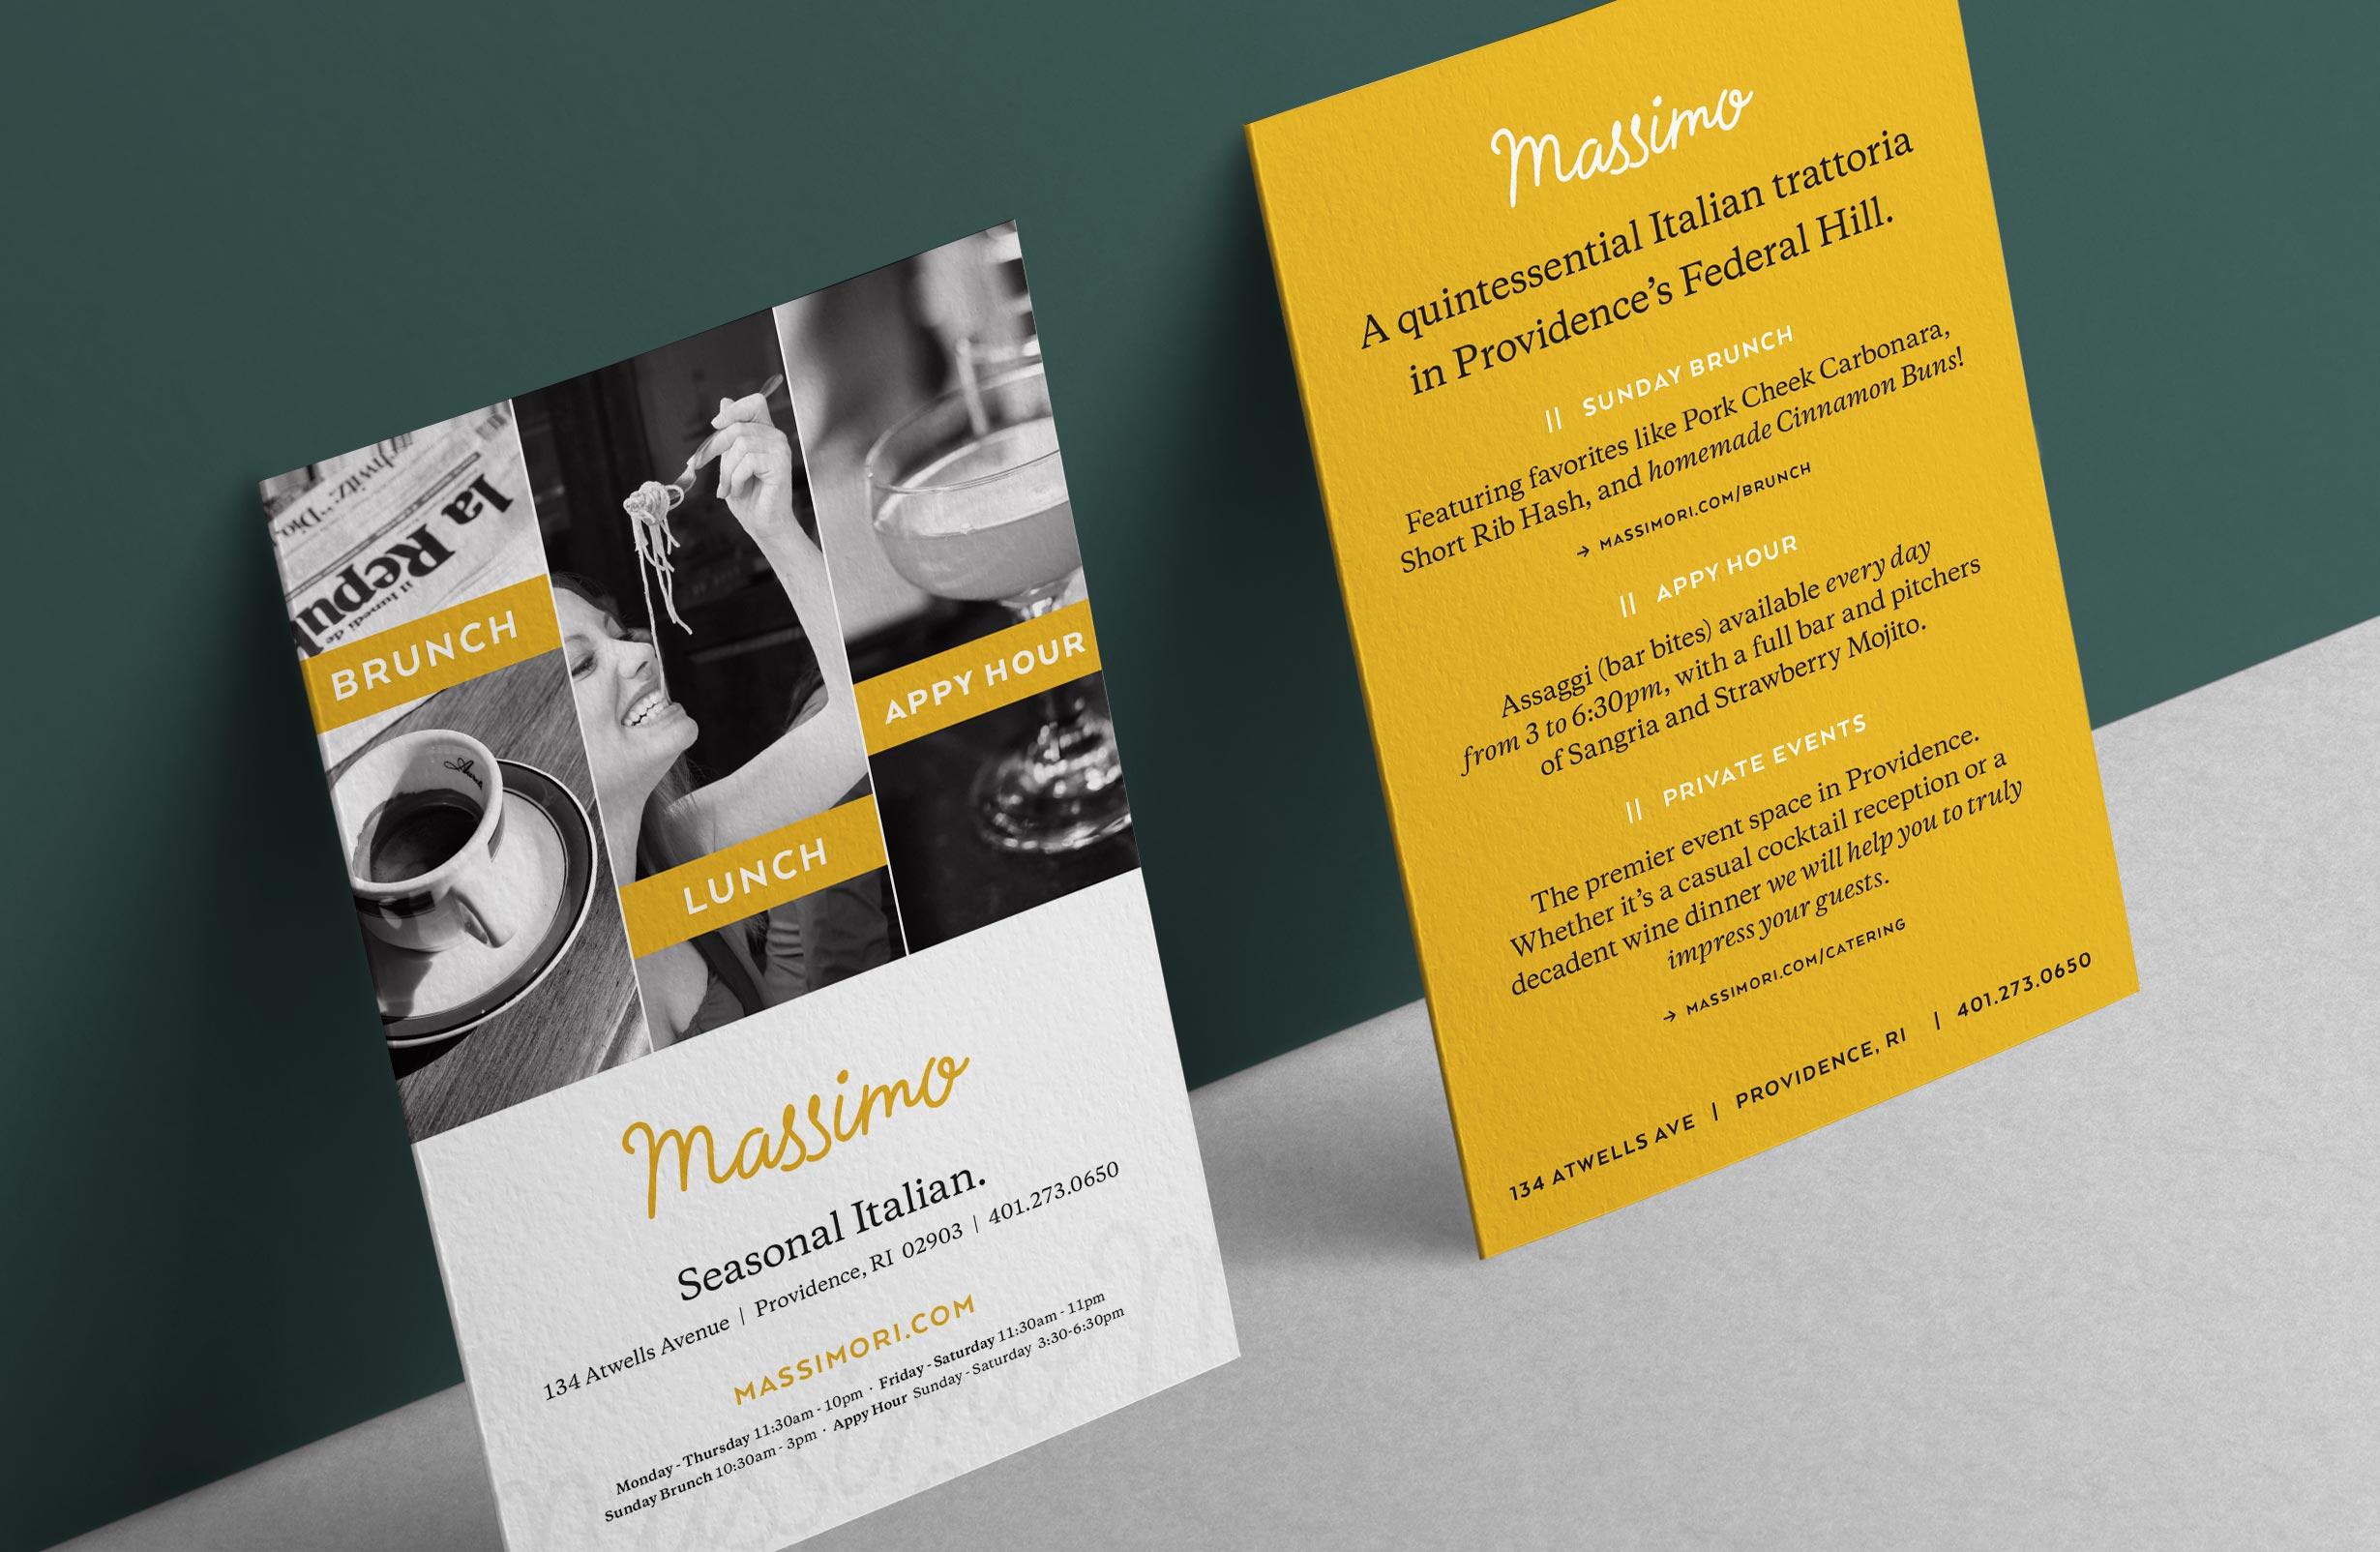 Providence restaurant logo, branding, advertisement, signage and web design